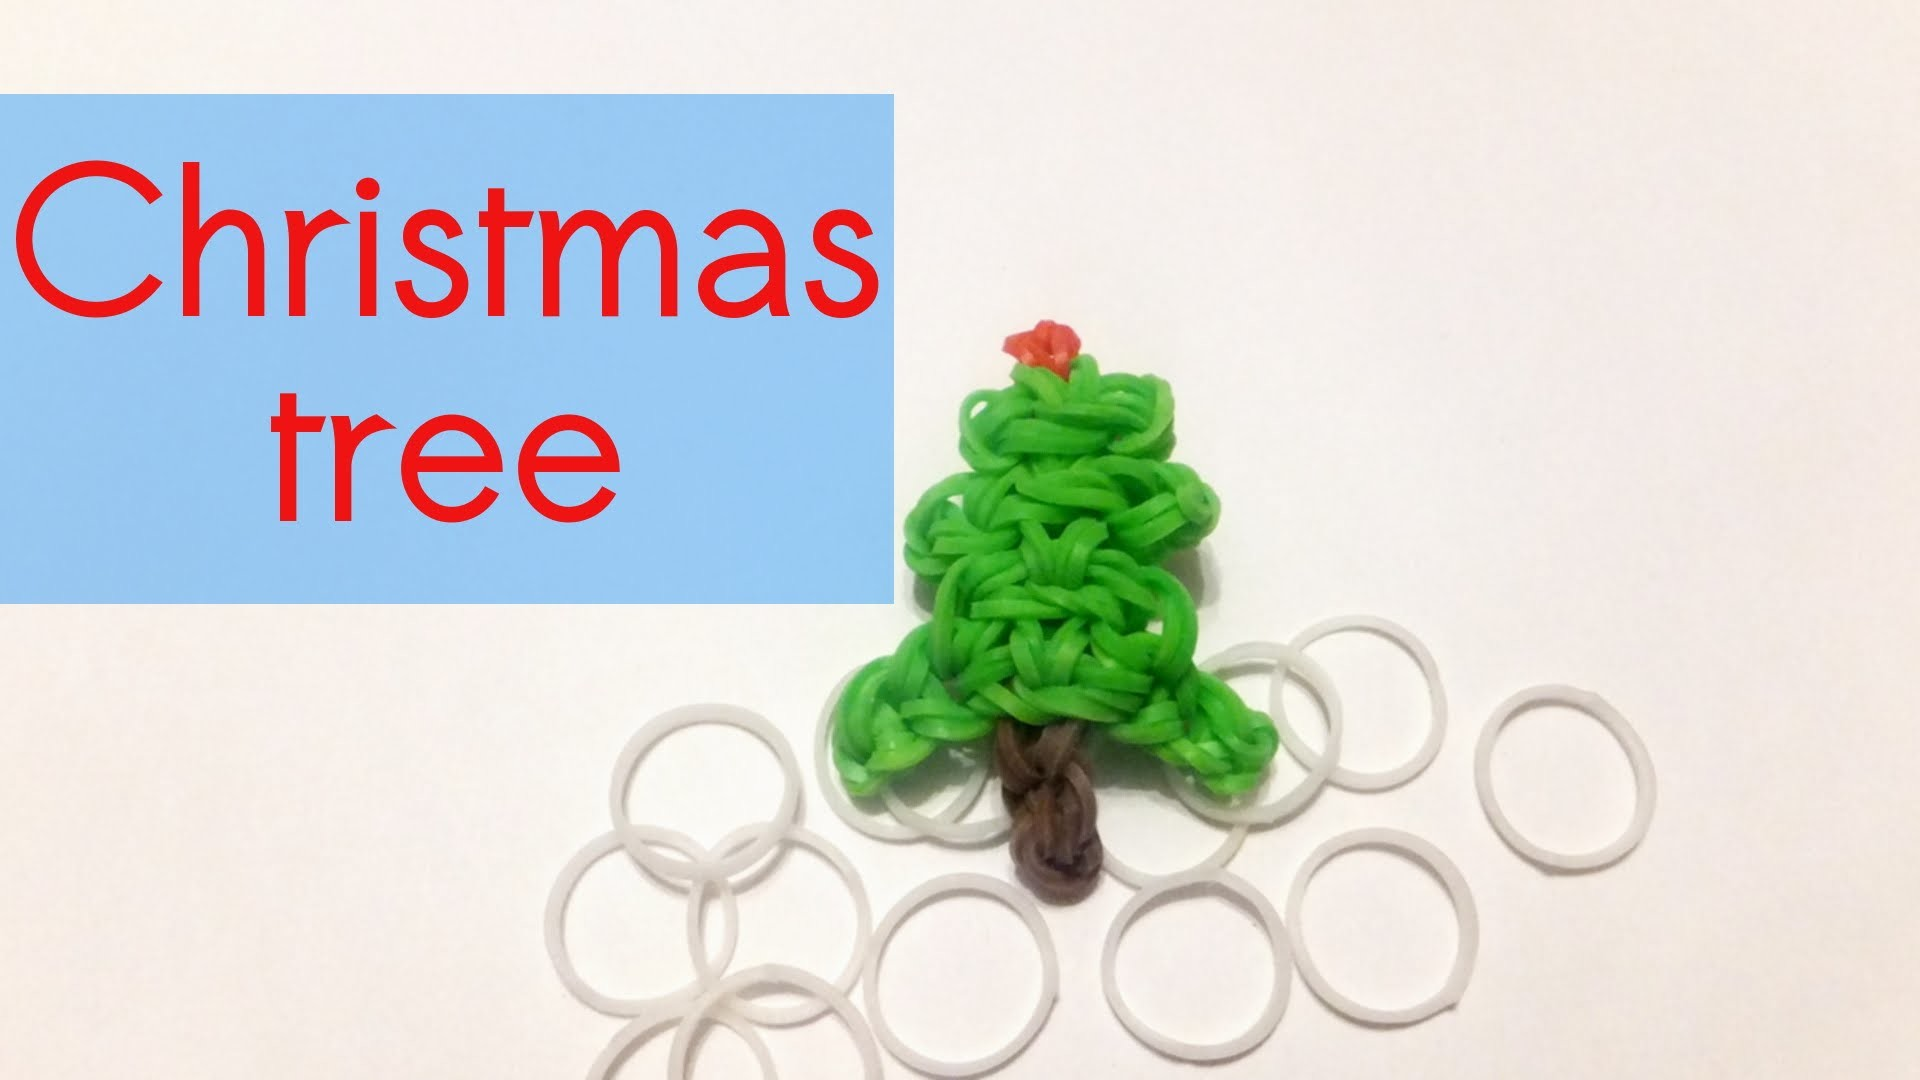 Rainbow Loom Christmas Tree Charm | Loom Bands How To